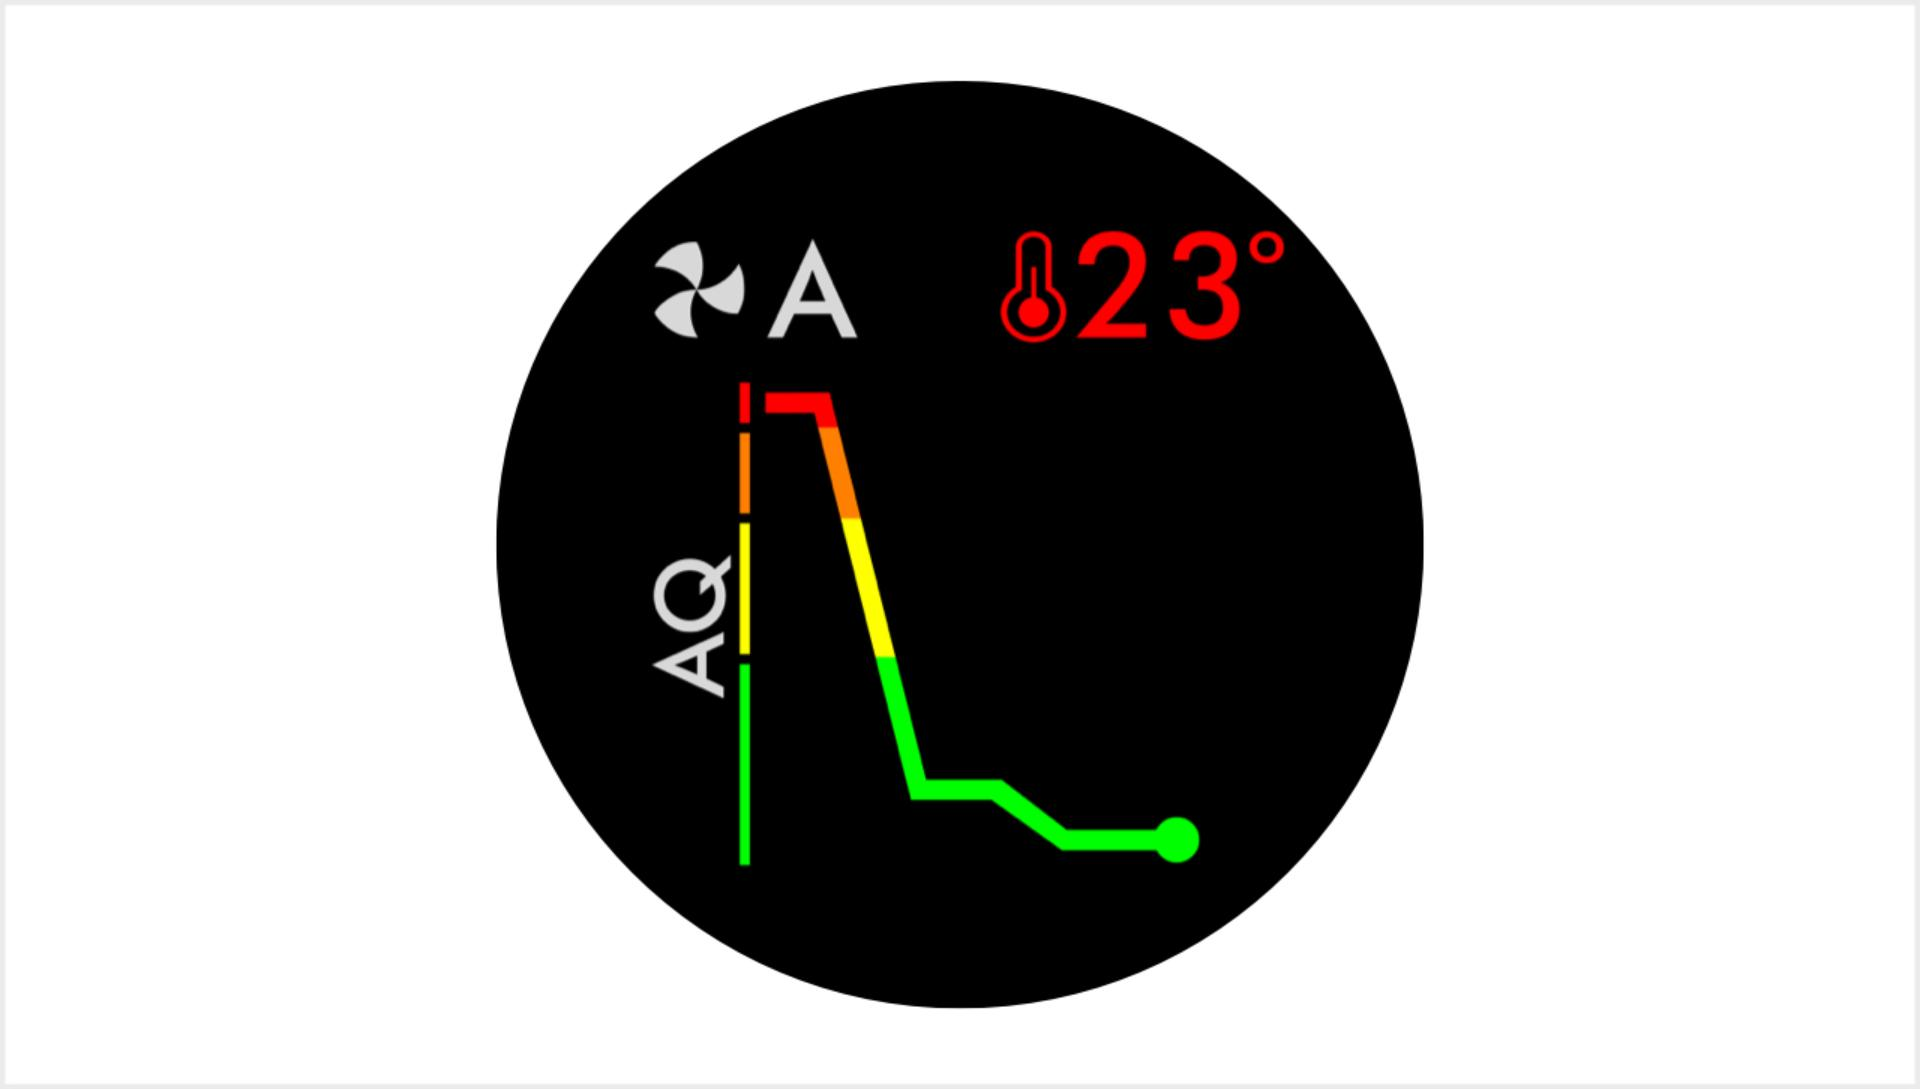 Indoor Air Quality Index screen